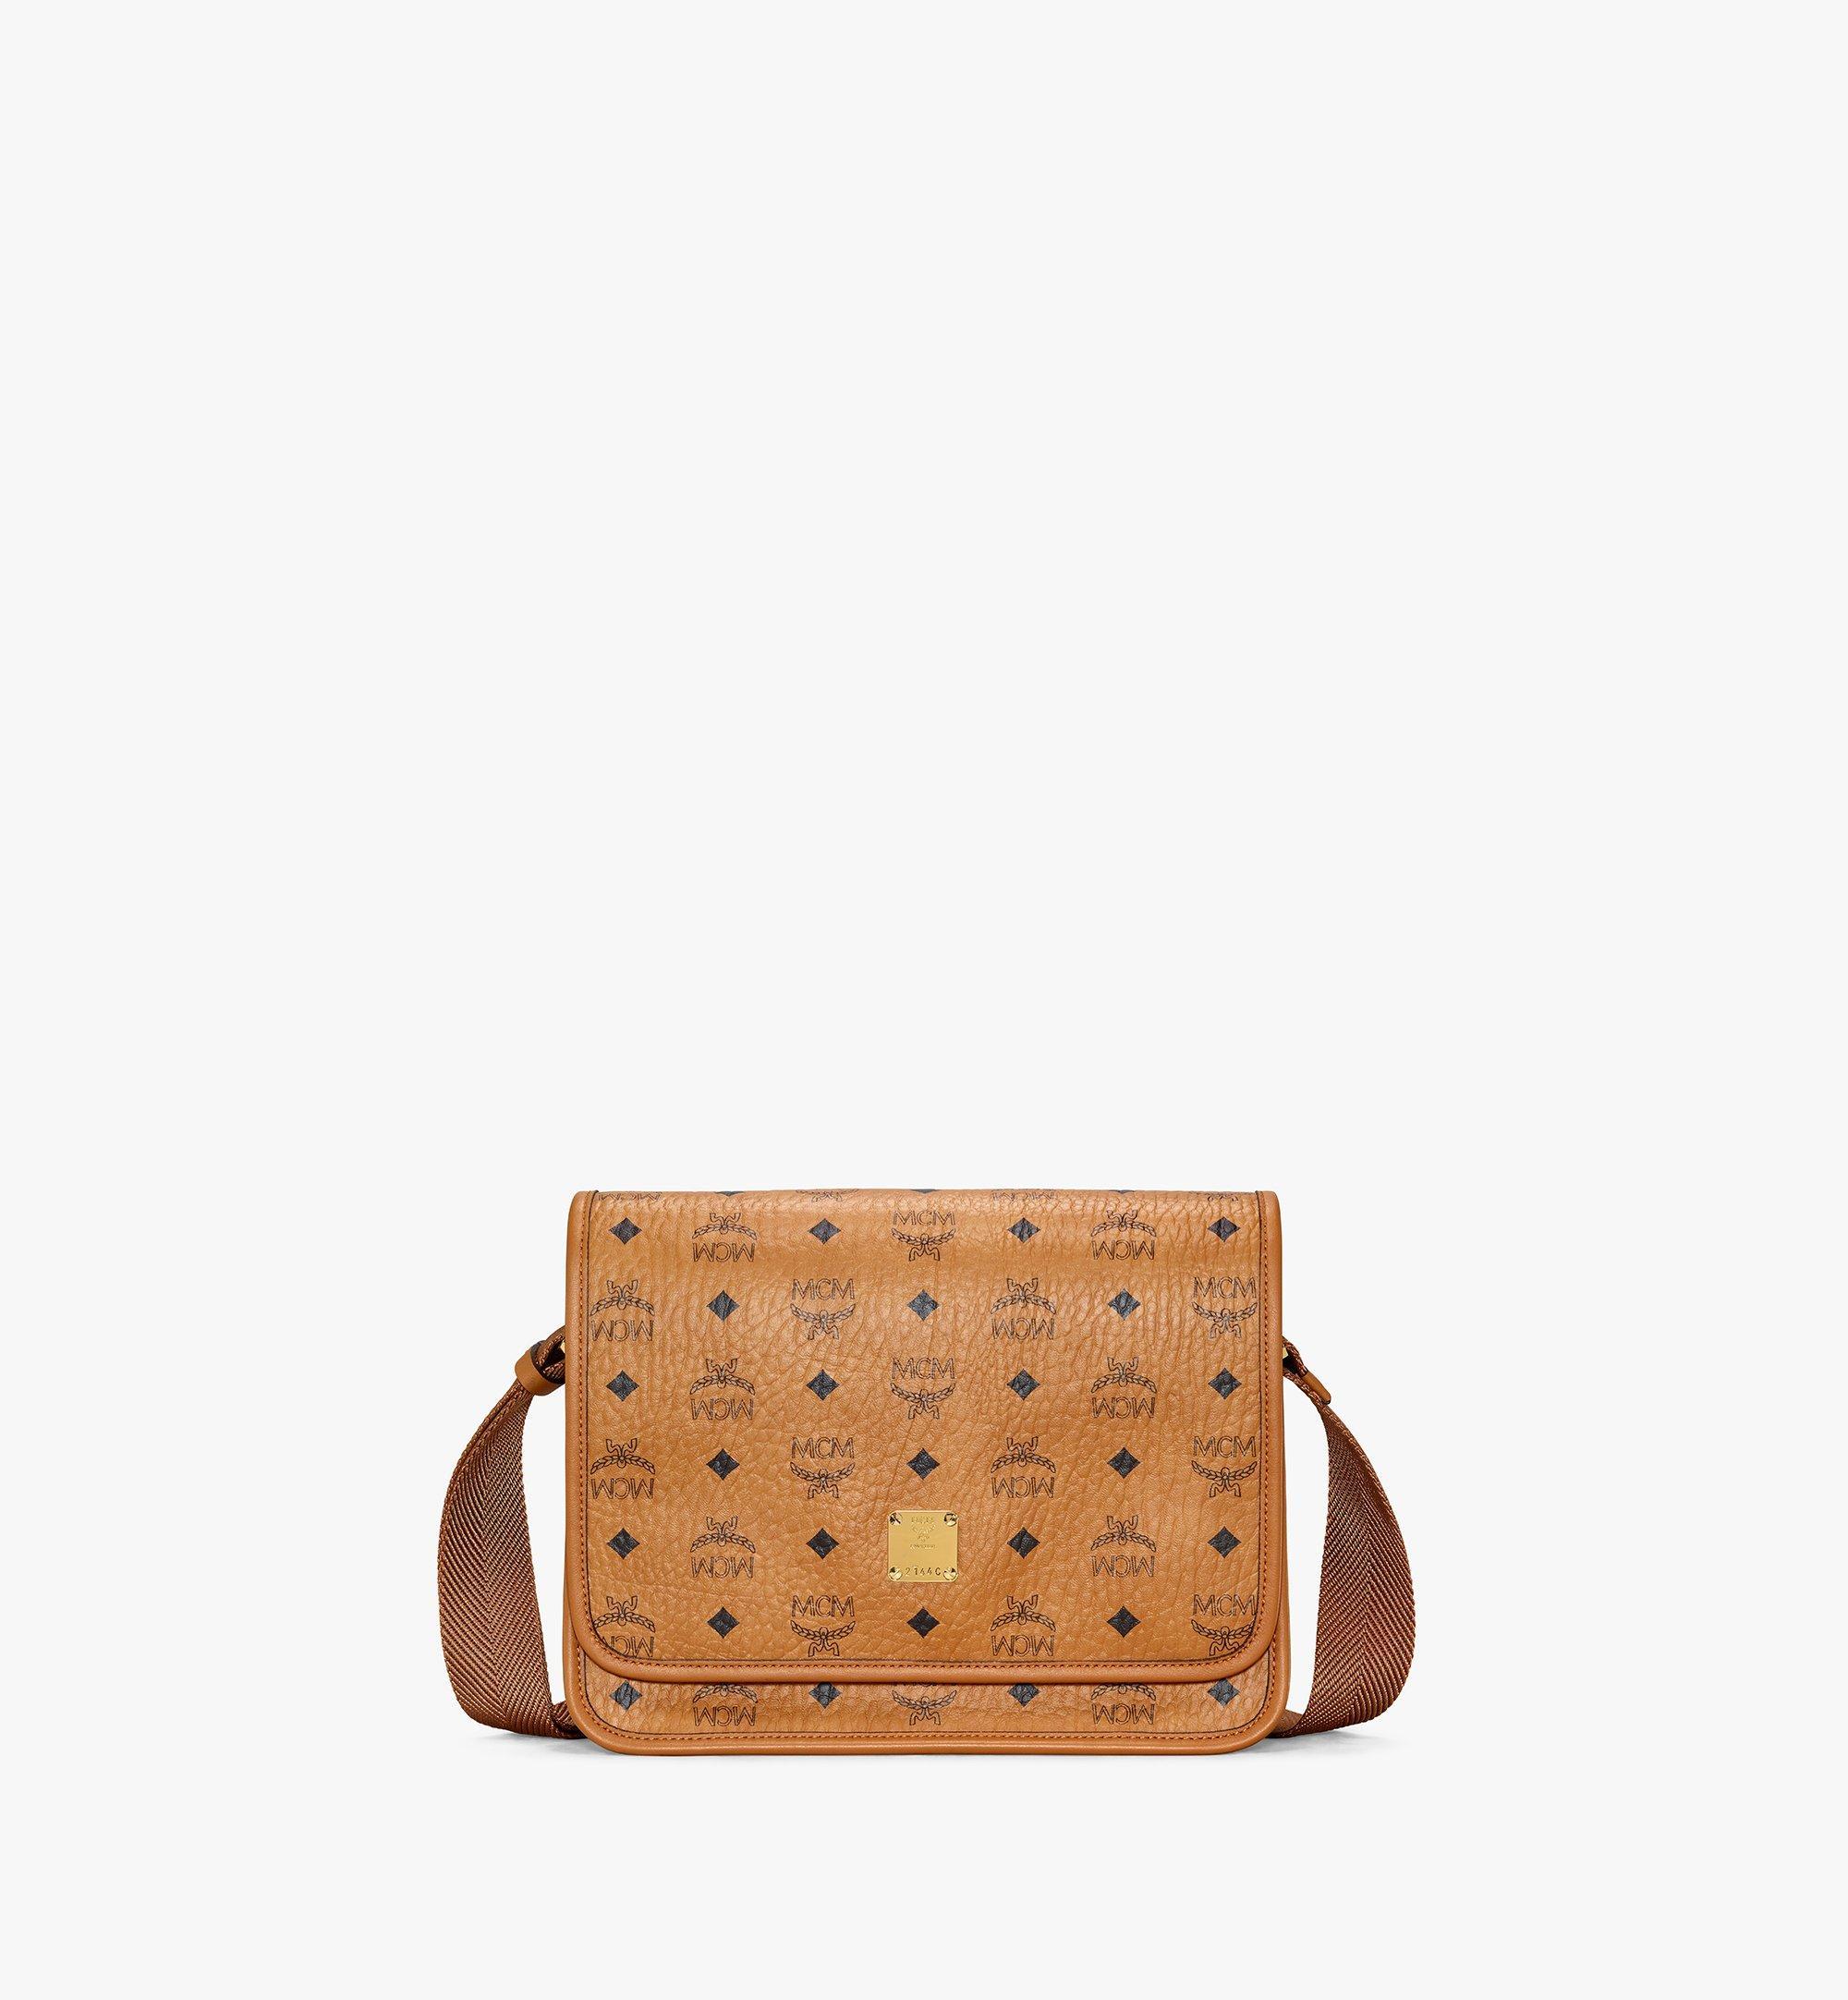 MCM Klassik Messenger Bag in Visetos Cognac MMMAAKC03CO001 Alternate View 1